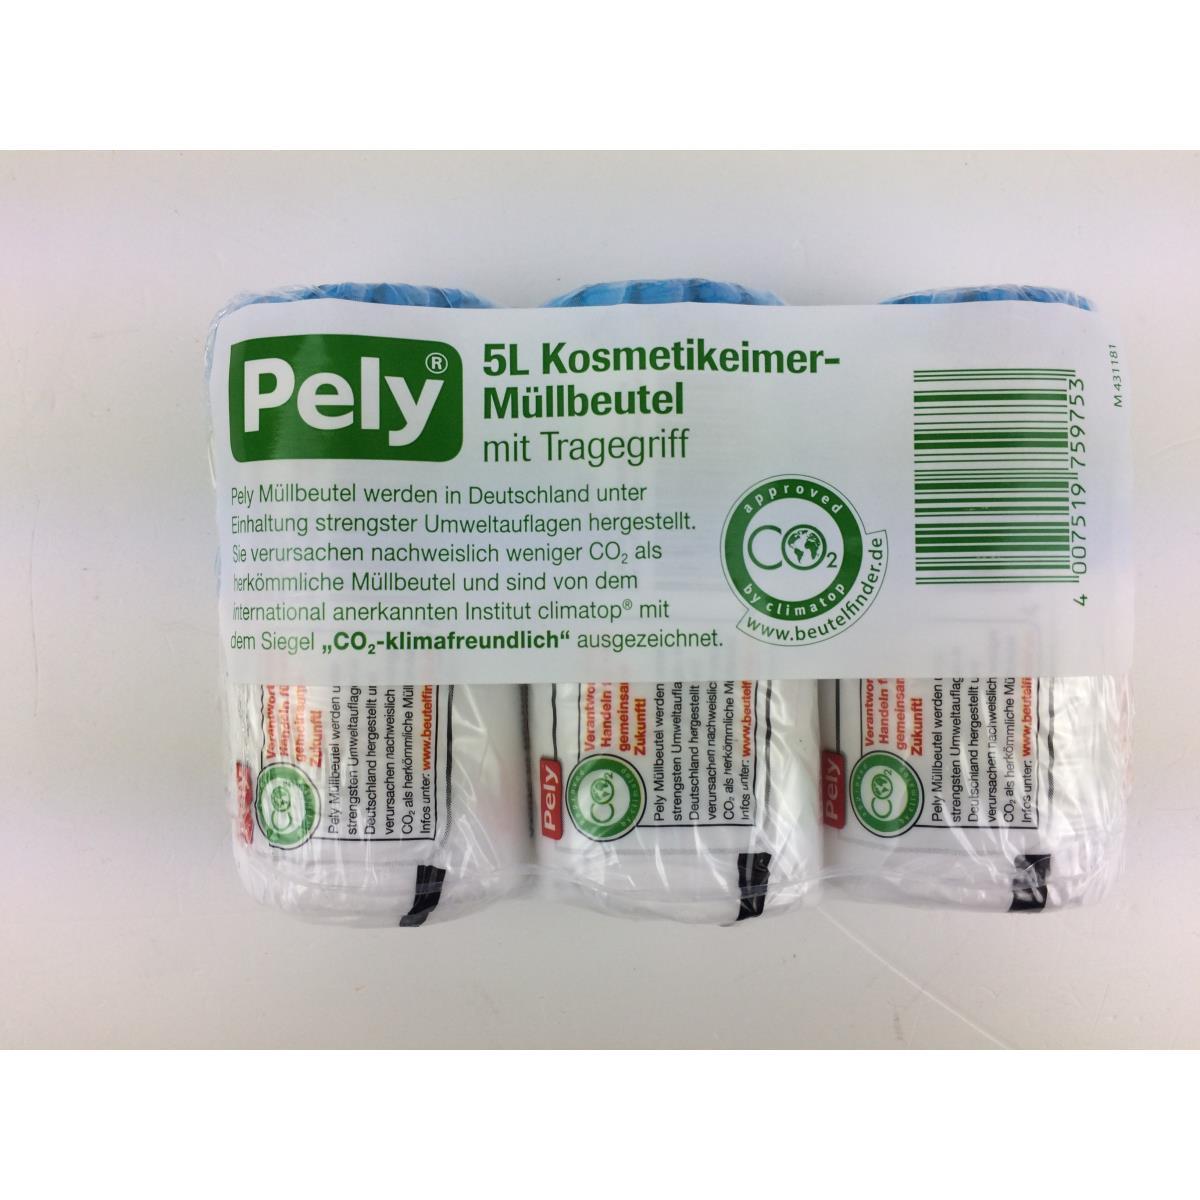 Pely Kosmetikeimer Müllbeutel mit Tragegriff  5 Liter 120 Stück,Pely,4007519759753, 4007519759753